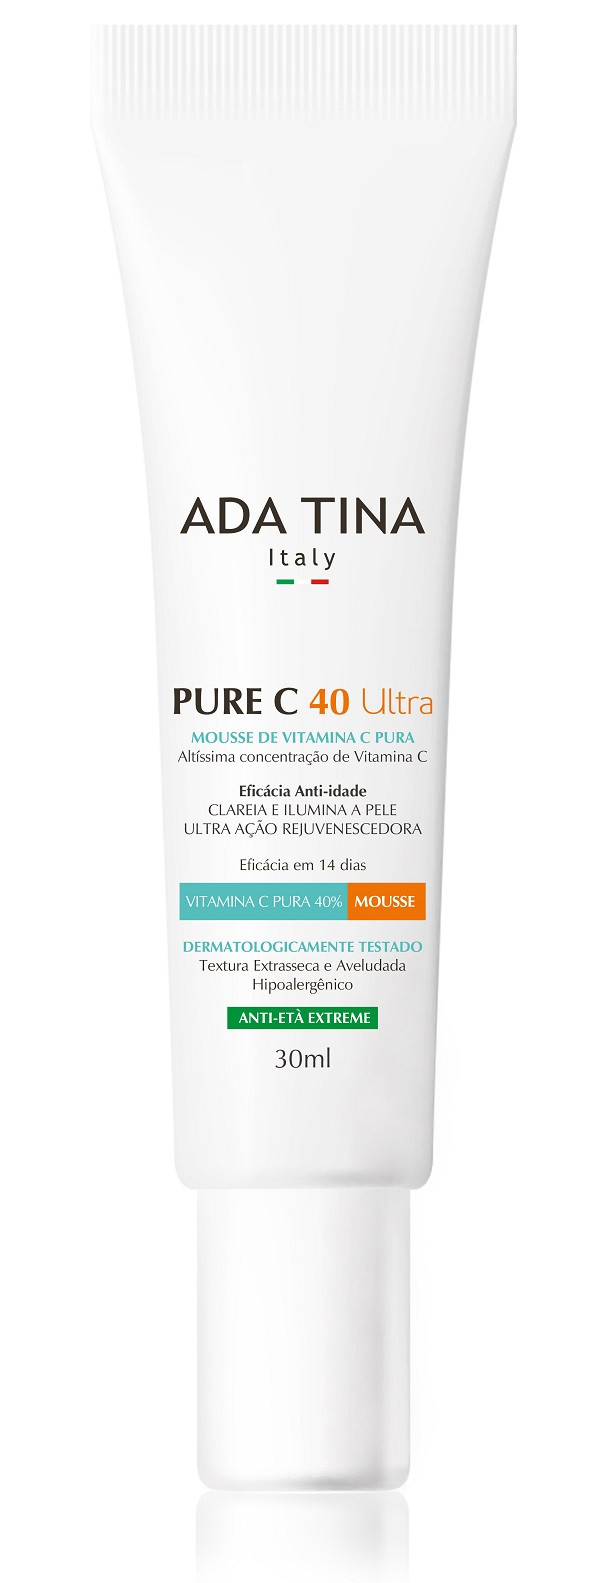 PURE C 40 ULTRA 30ml - Ada Tina